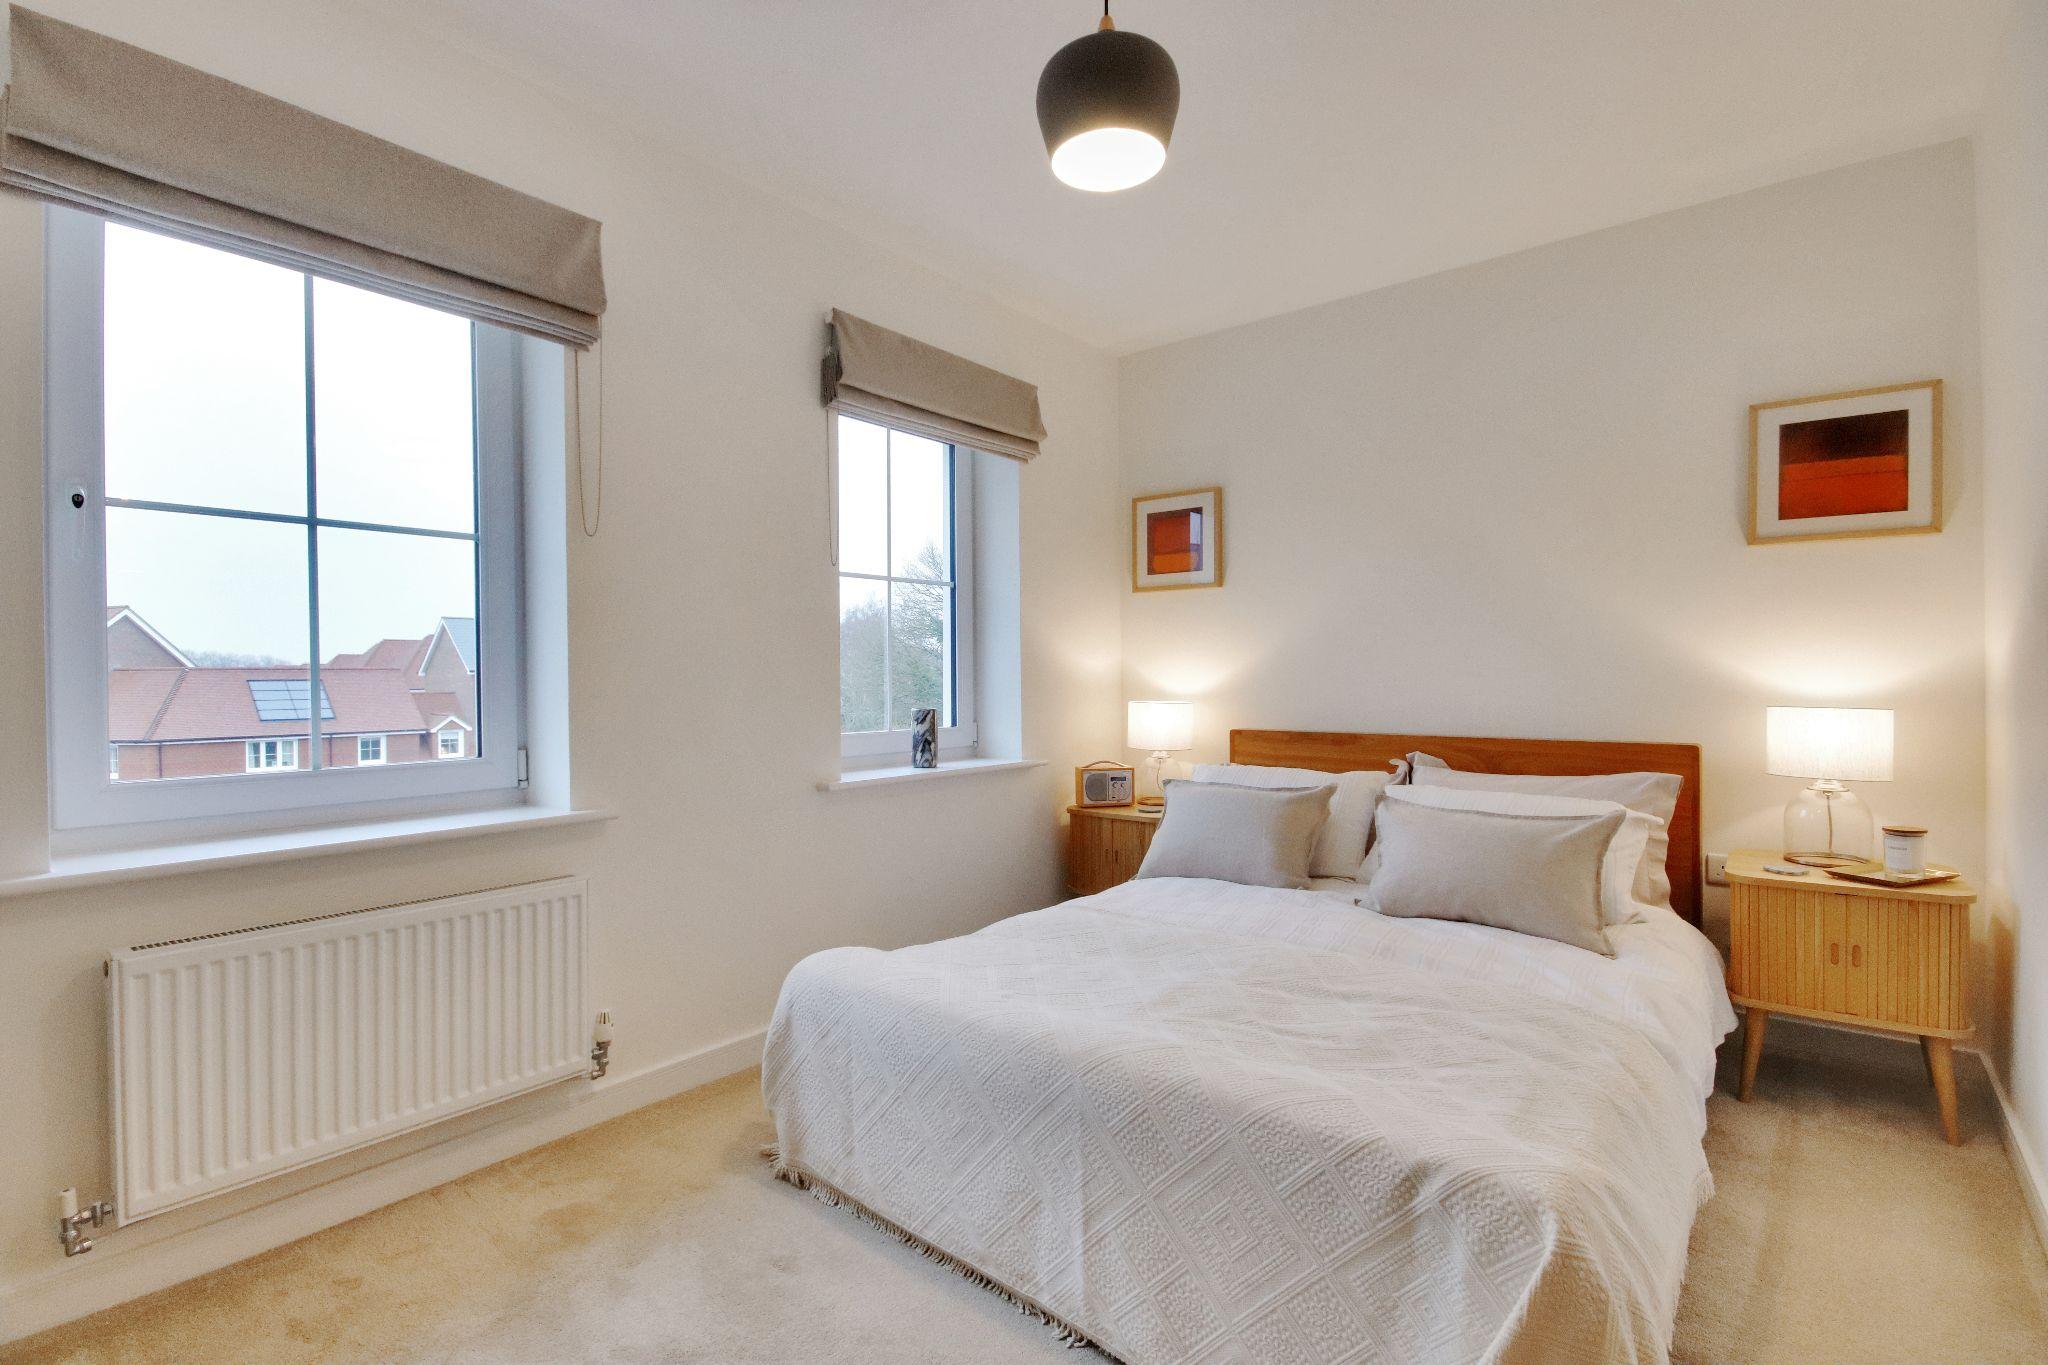 3 bedroom mid terraced house Sold in Sevenoaks - Photograph 8